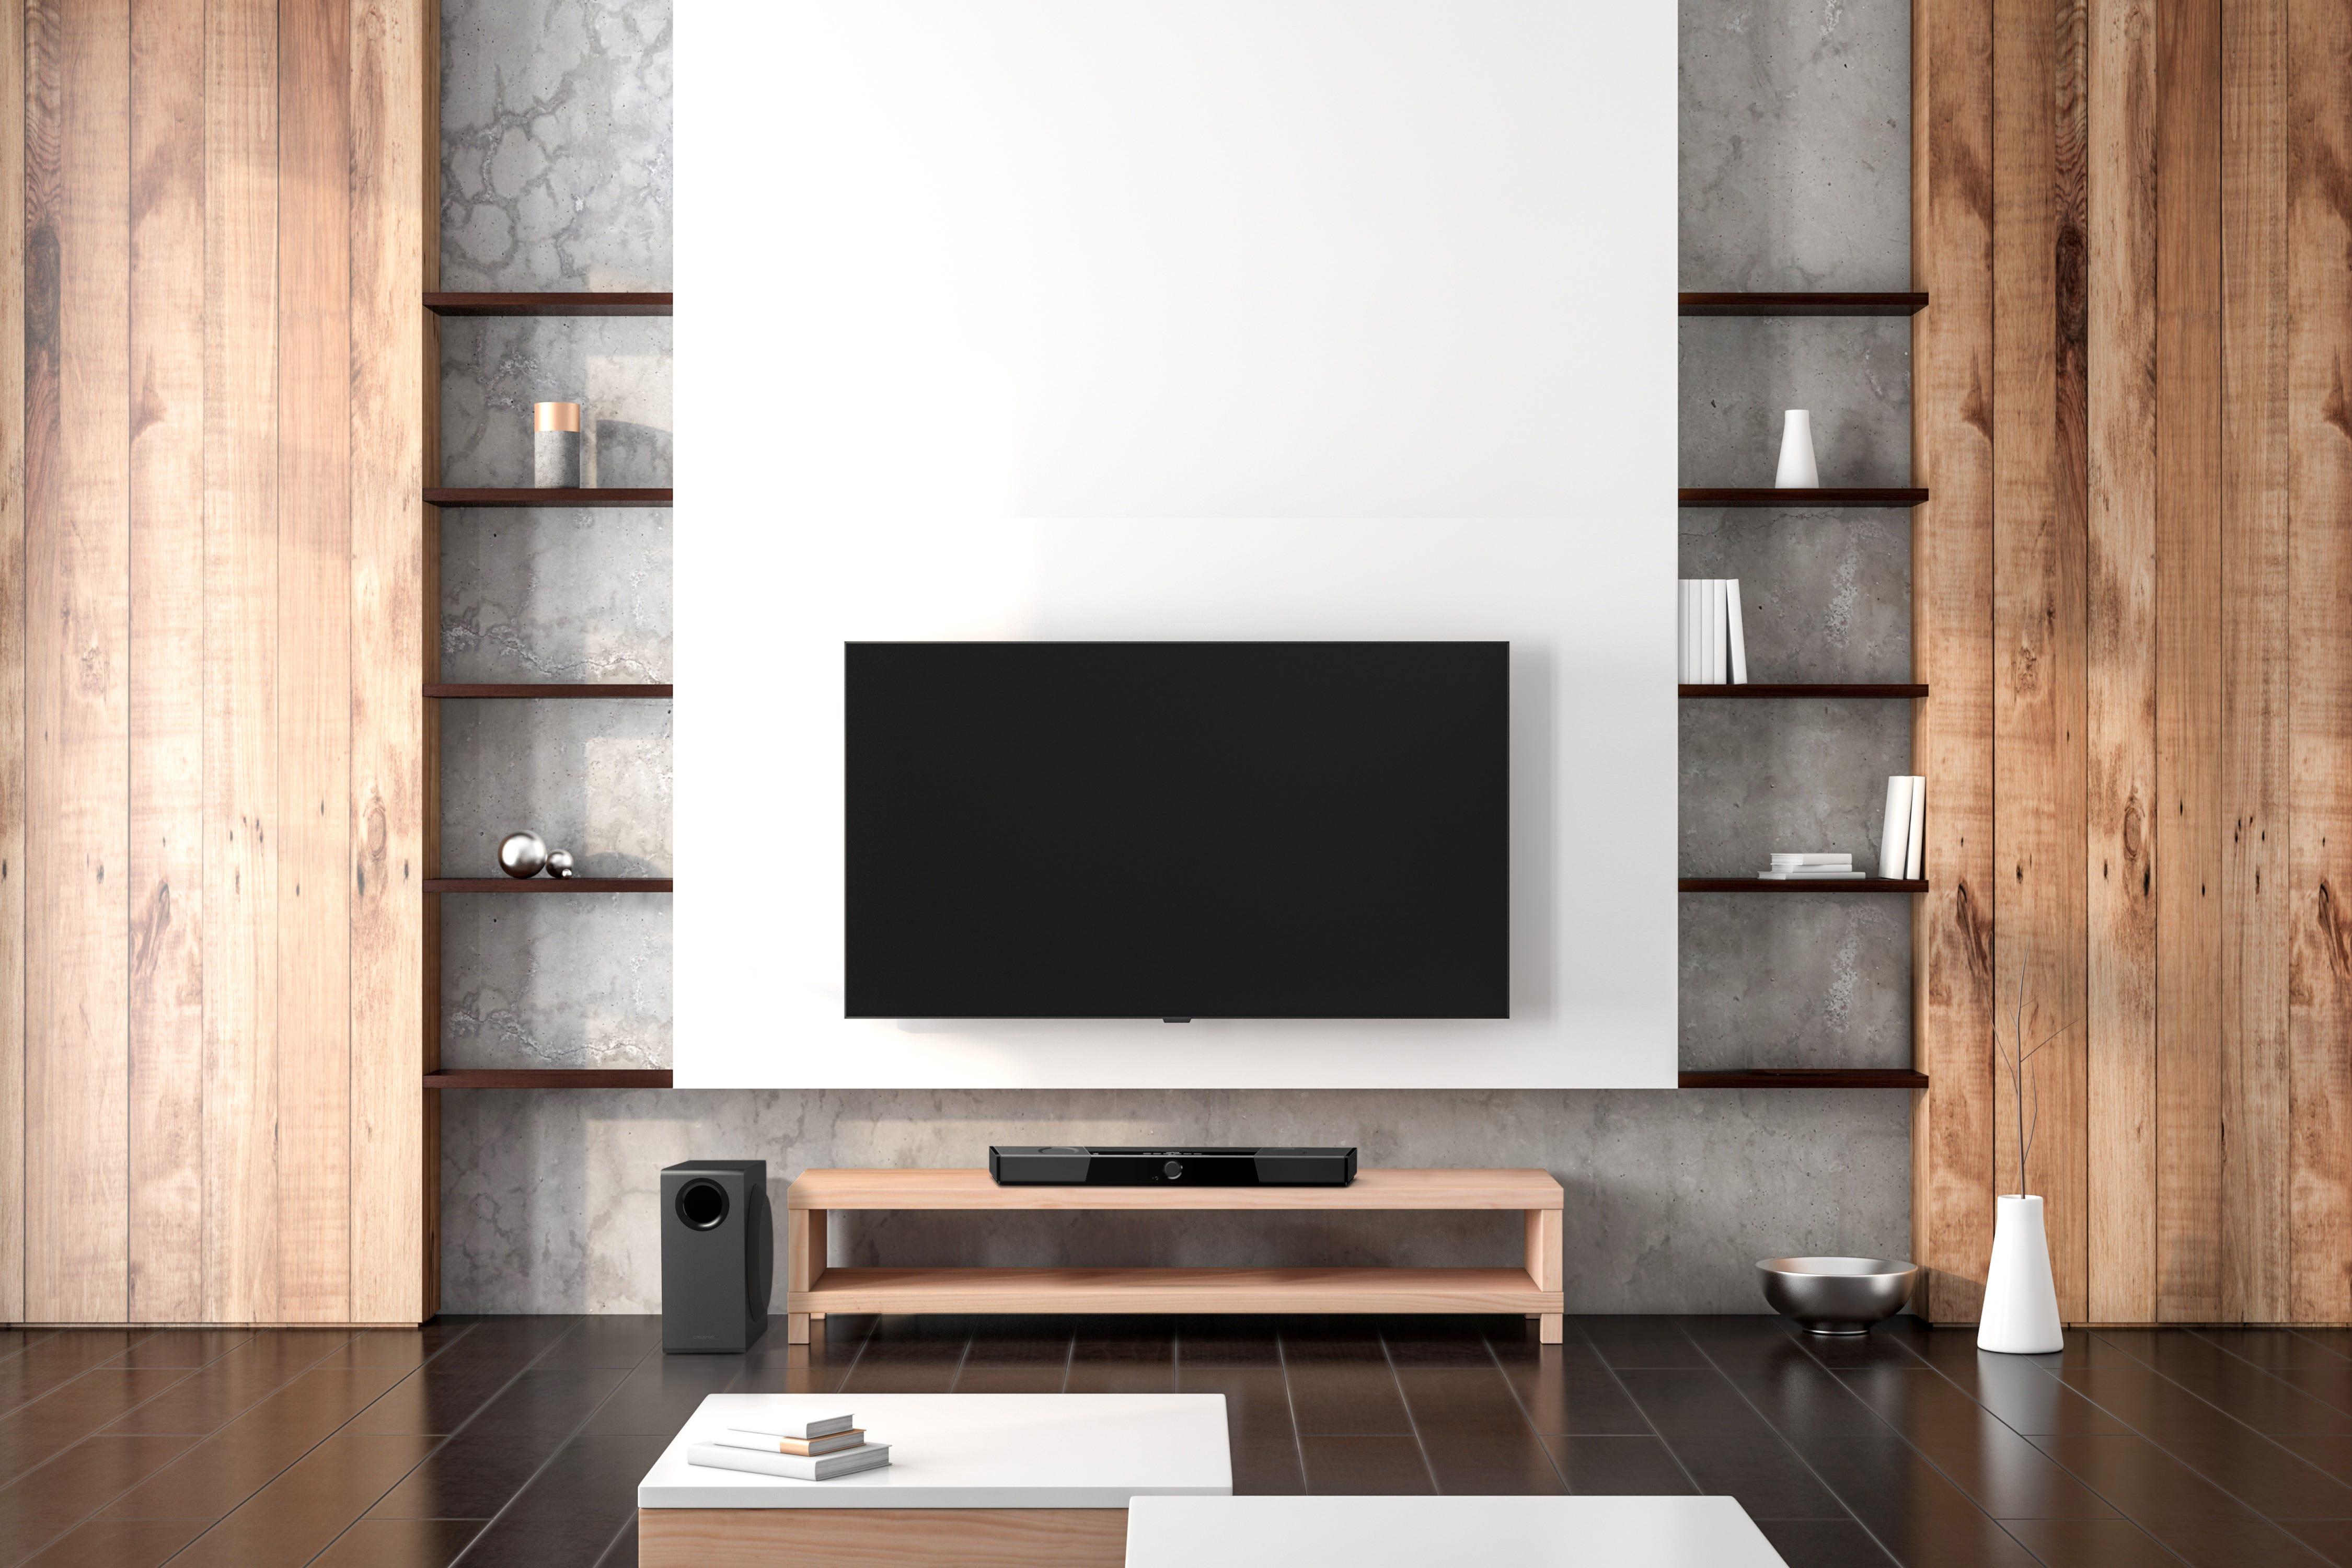 Creative Super X-Fi Carrier soundbar beneath a TV in a modern room setting